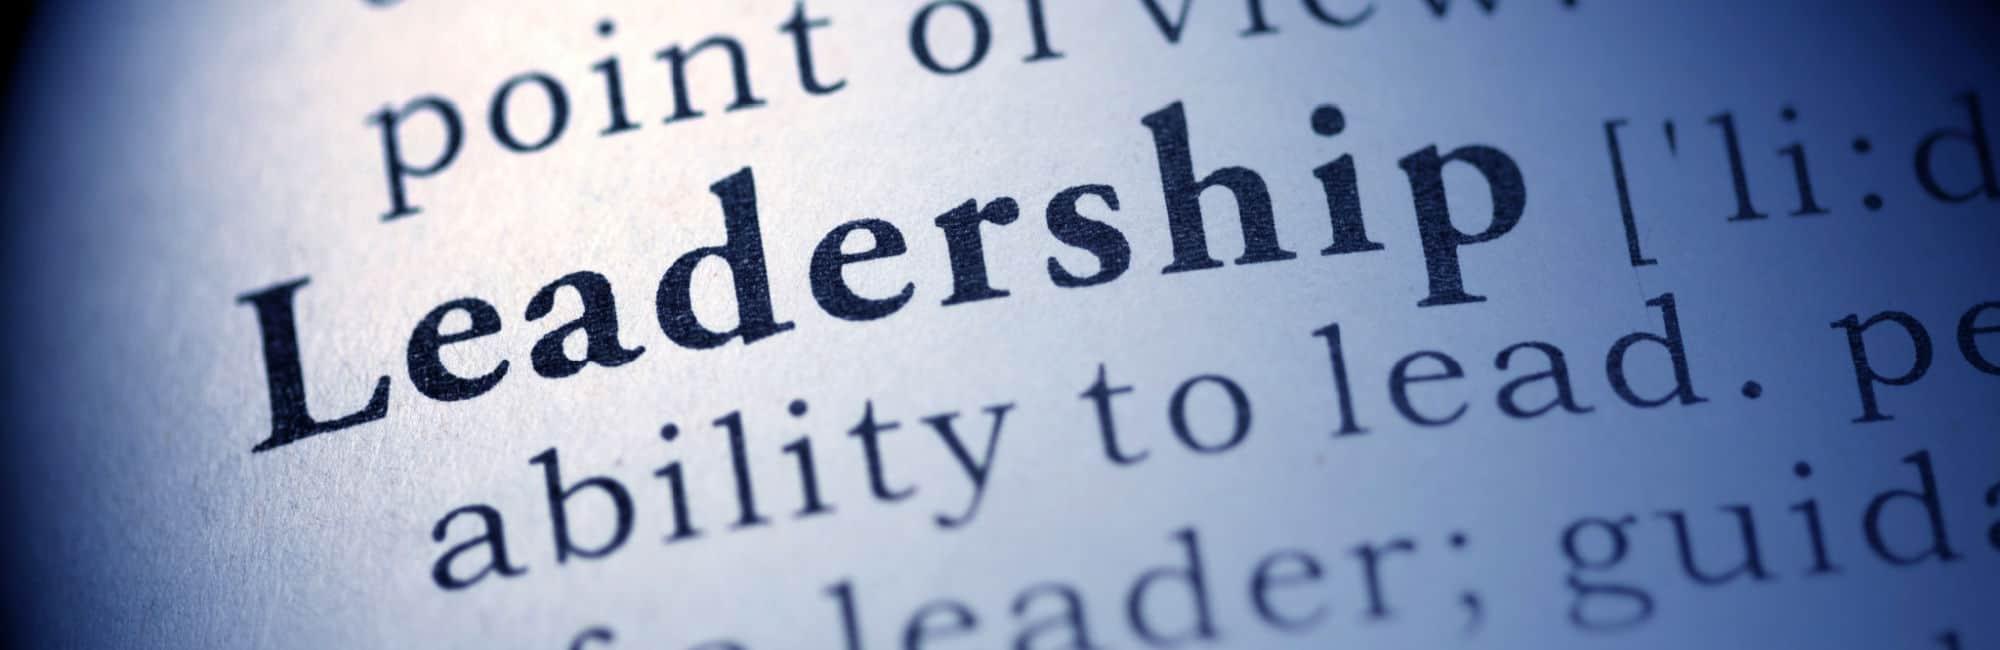 How do you define leadership?